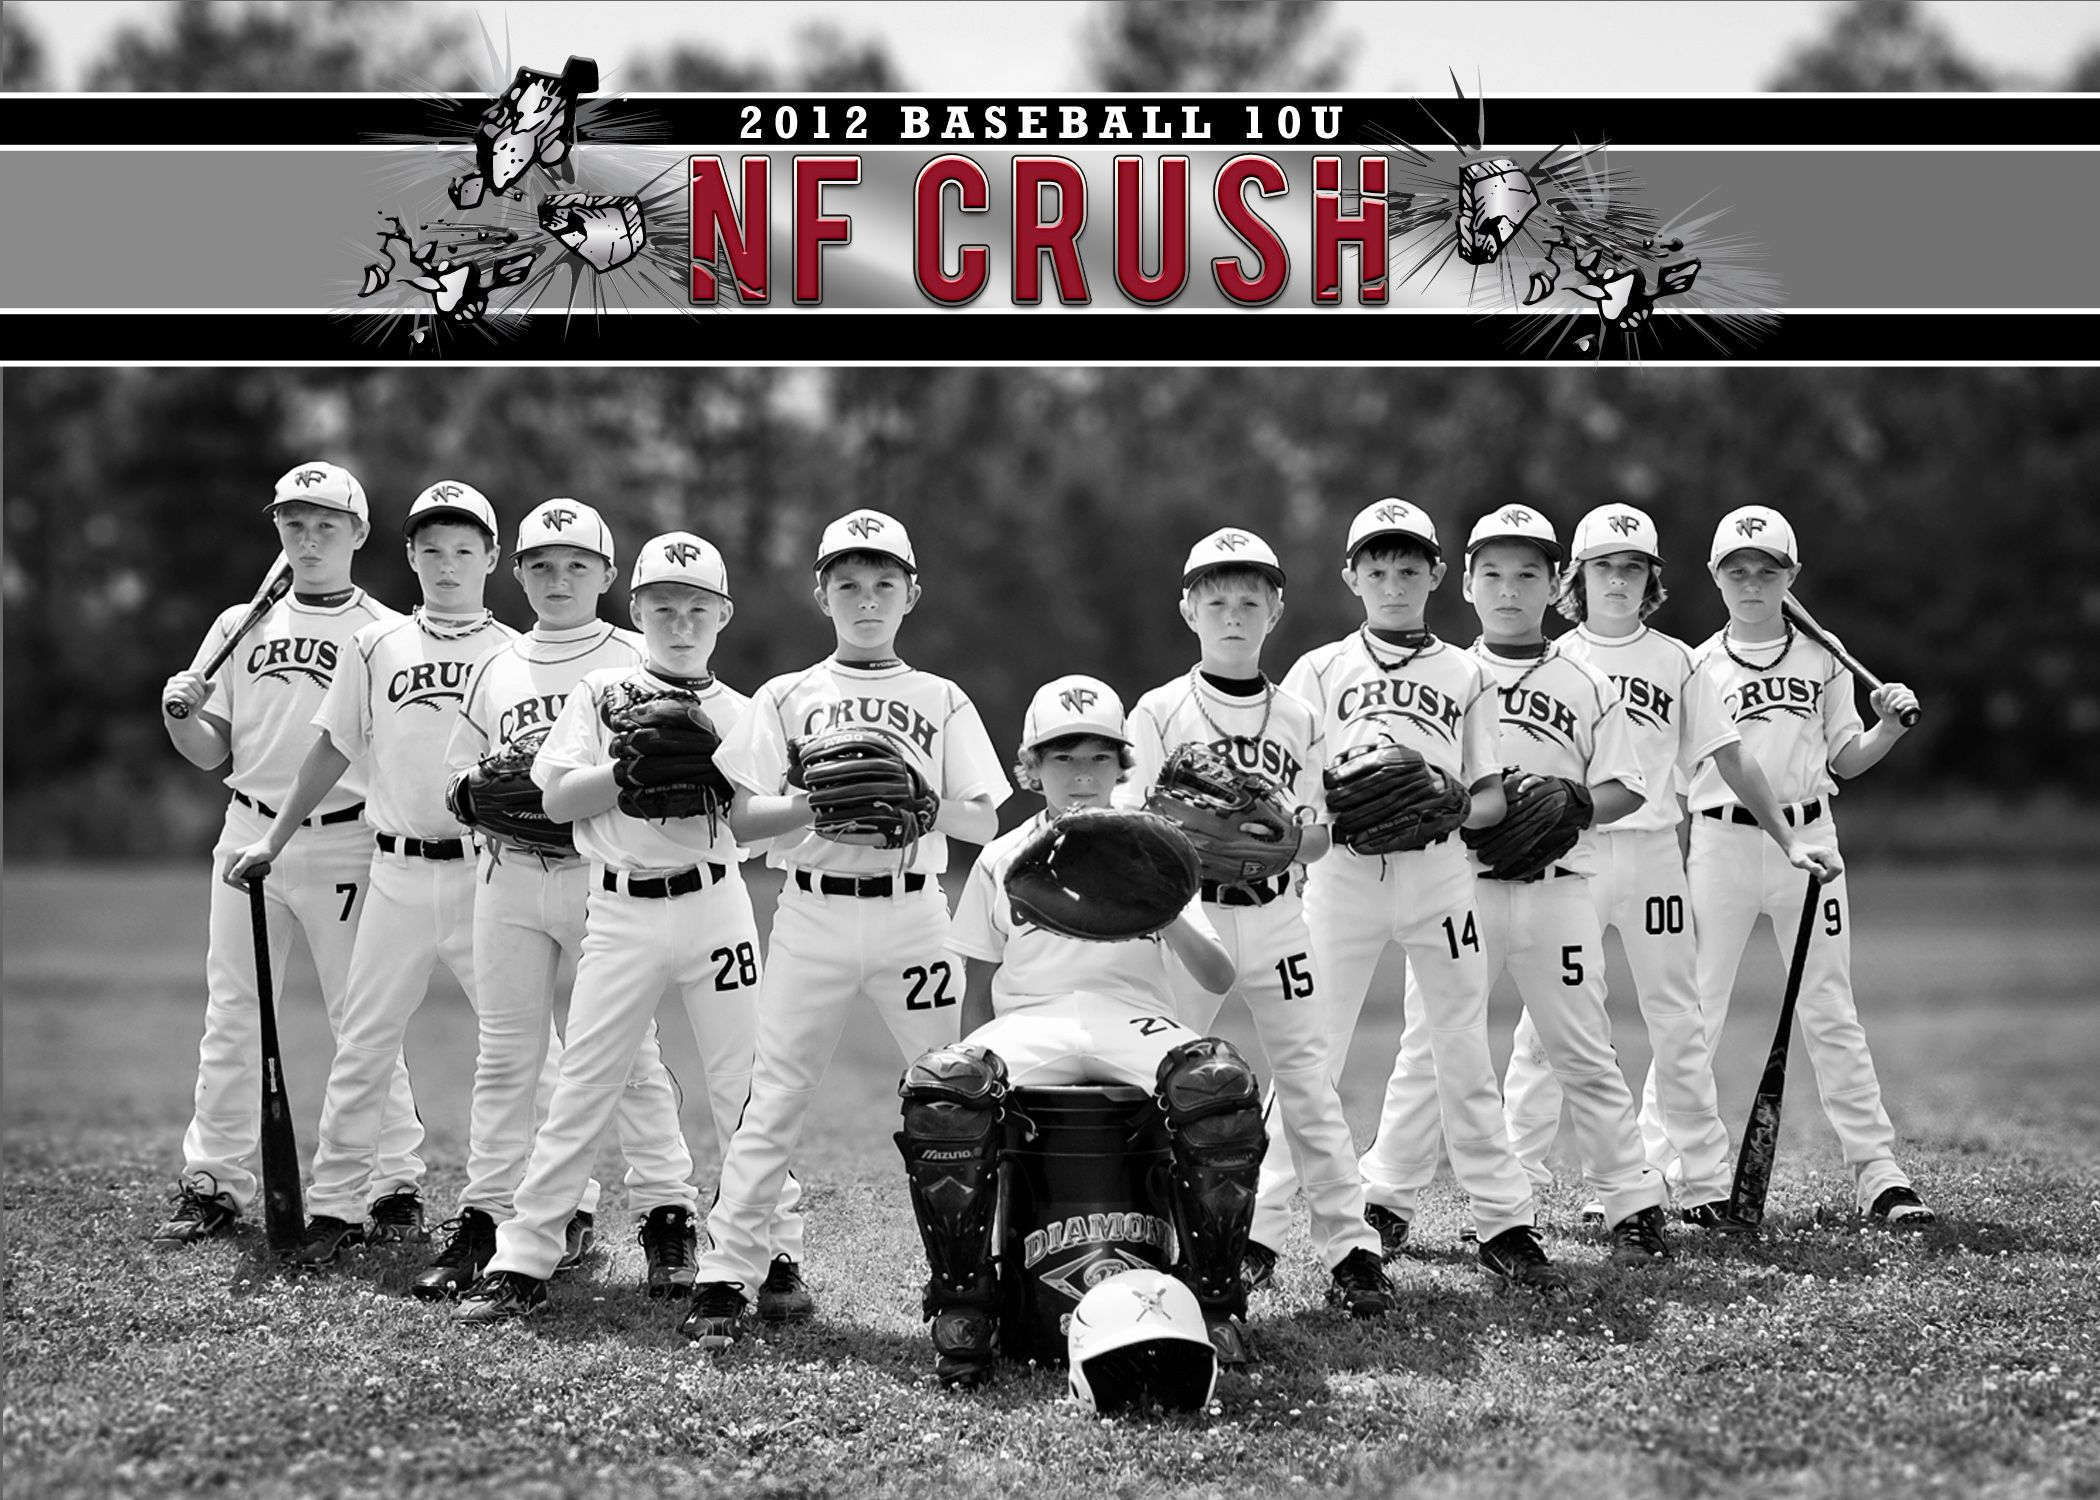 Baseball team photo sports photos pinterest for Team picture ideas